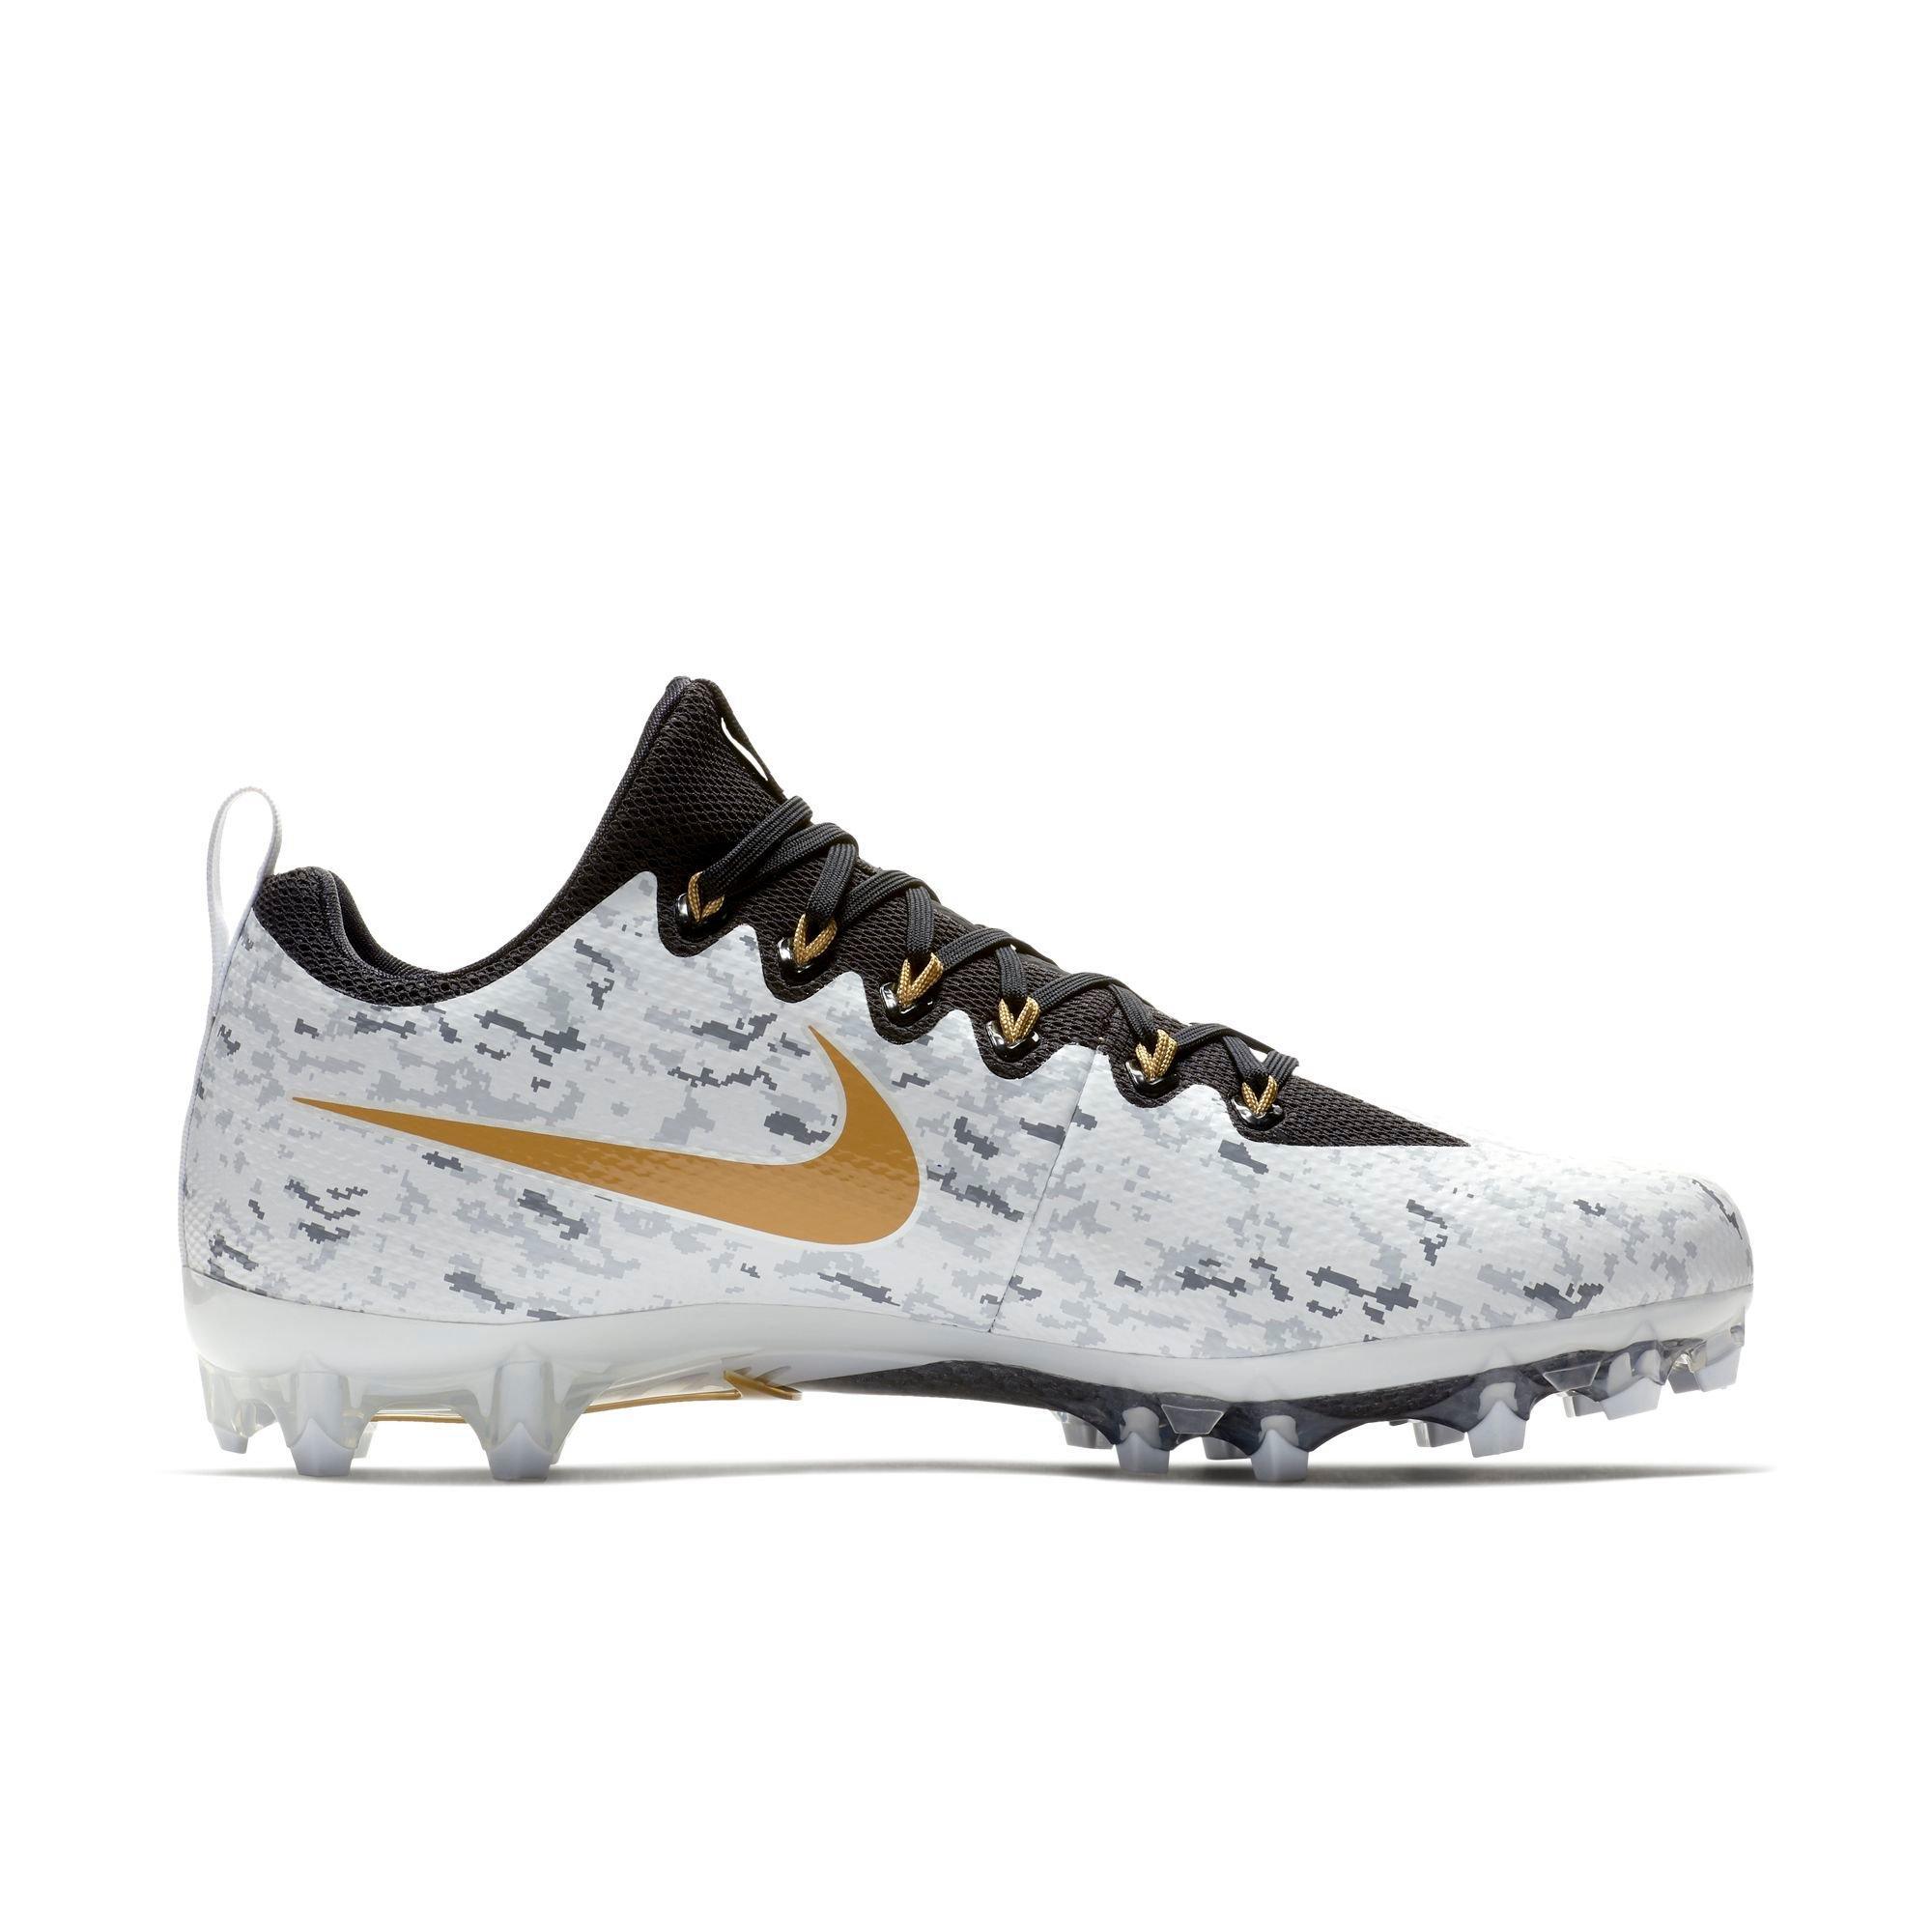 d2ec0511d0 exclusive jordan shoes nike football gold cleats – Eco² Wattconseil